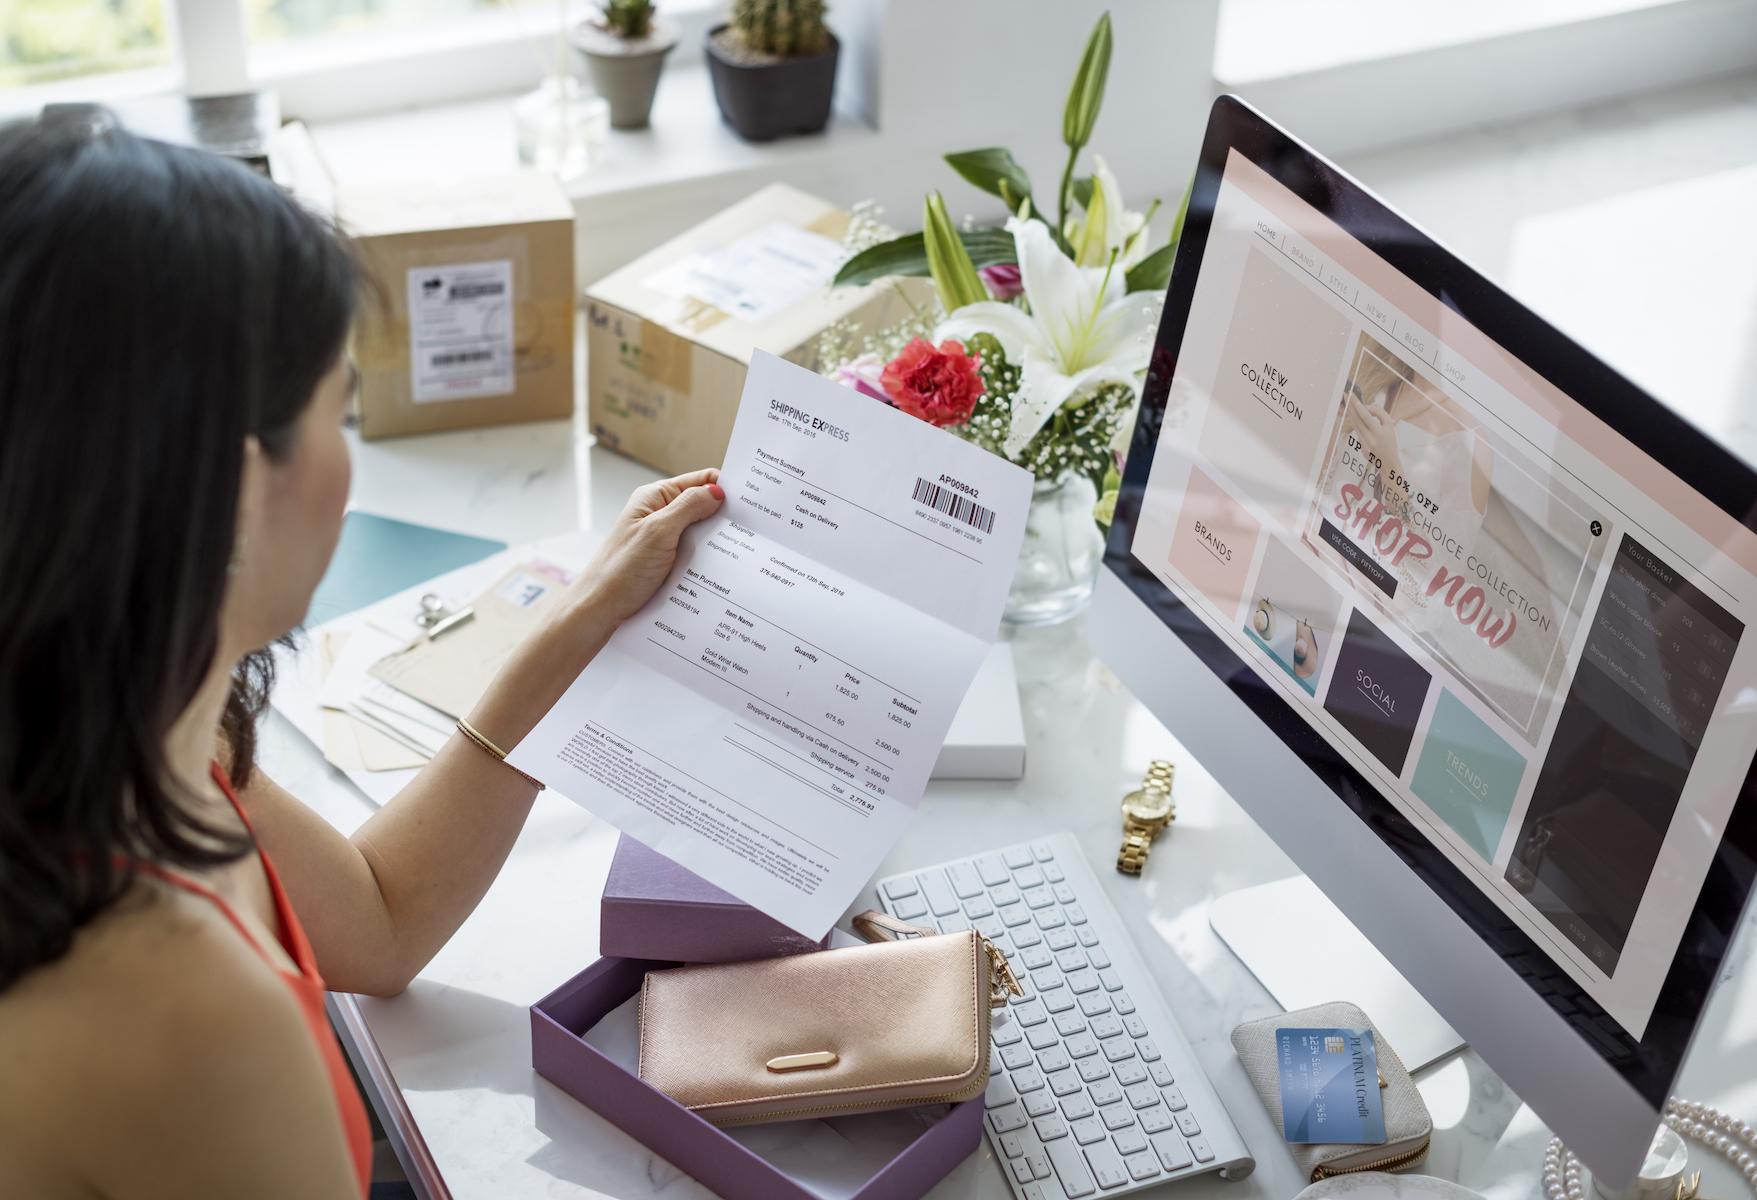 Women Shopping Online Shopaholics Purchase Concept Cara Menjadi Eksportir Pemula yang Sukses - women shopping online shopaholics purchase PMMWYU2 - Cara Menjadi Eksportir Pemula yang Sukses